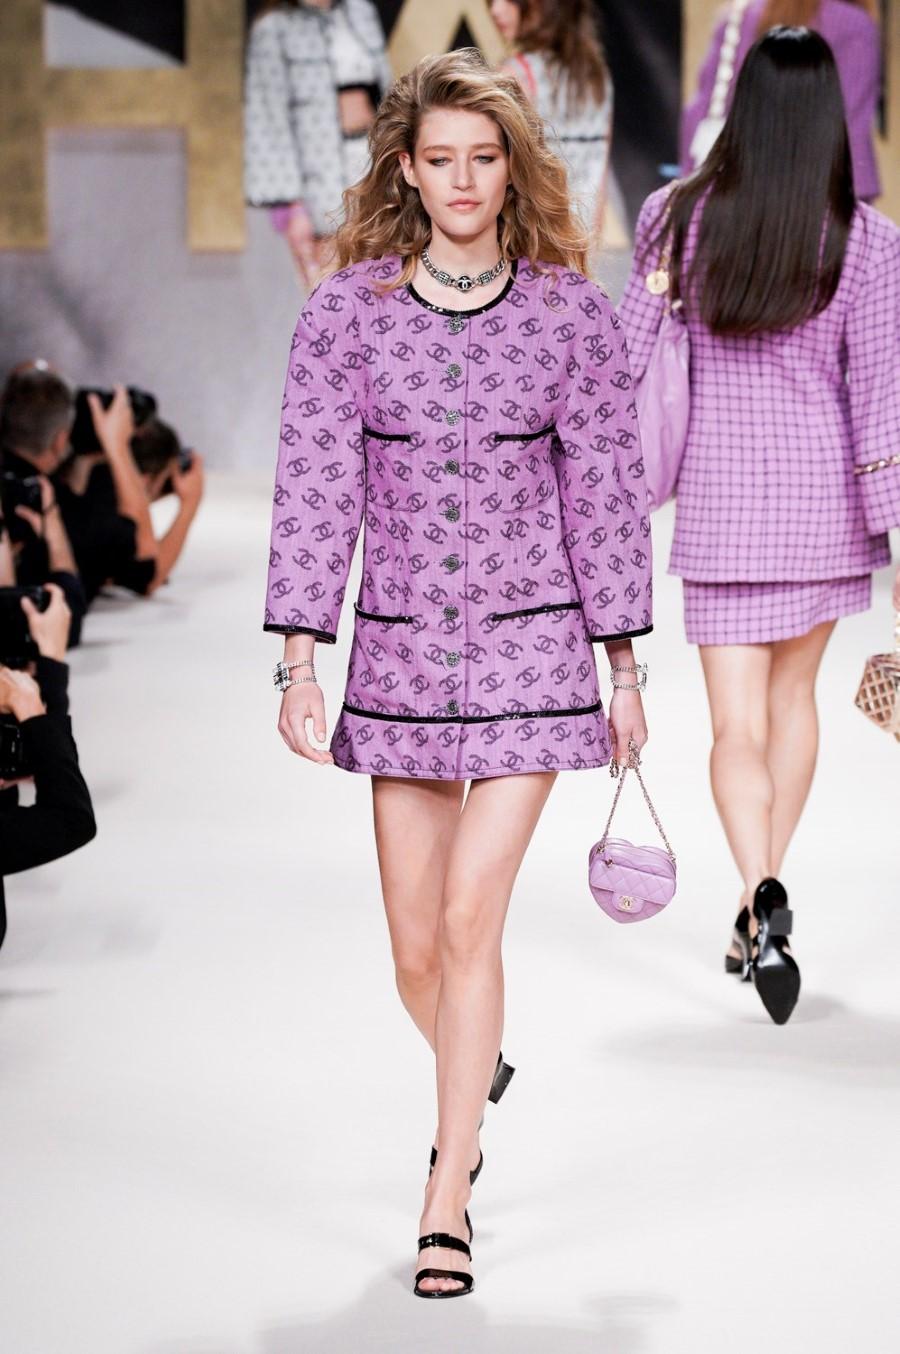 Chanel Spring Summer 2022 - Paris Fashion Week